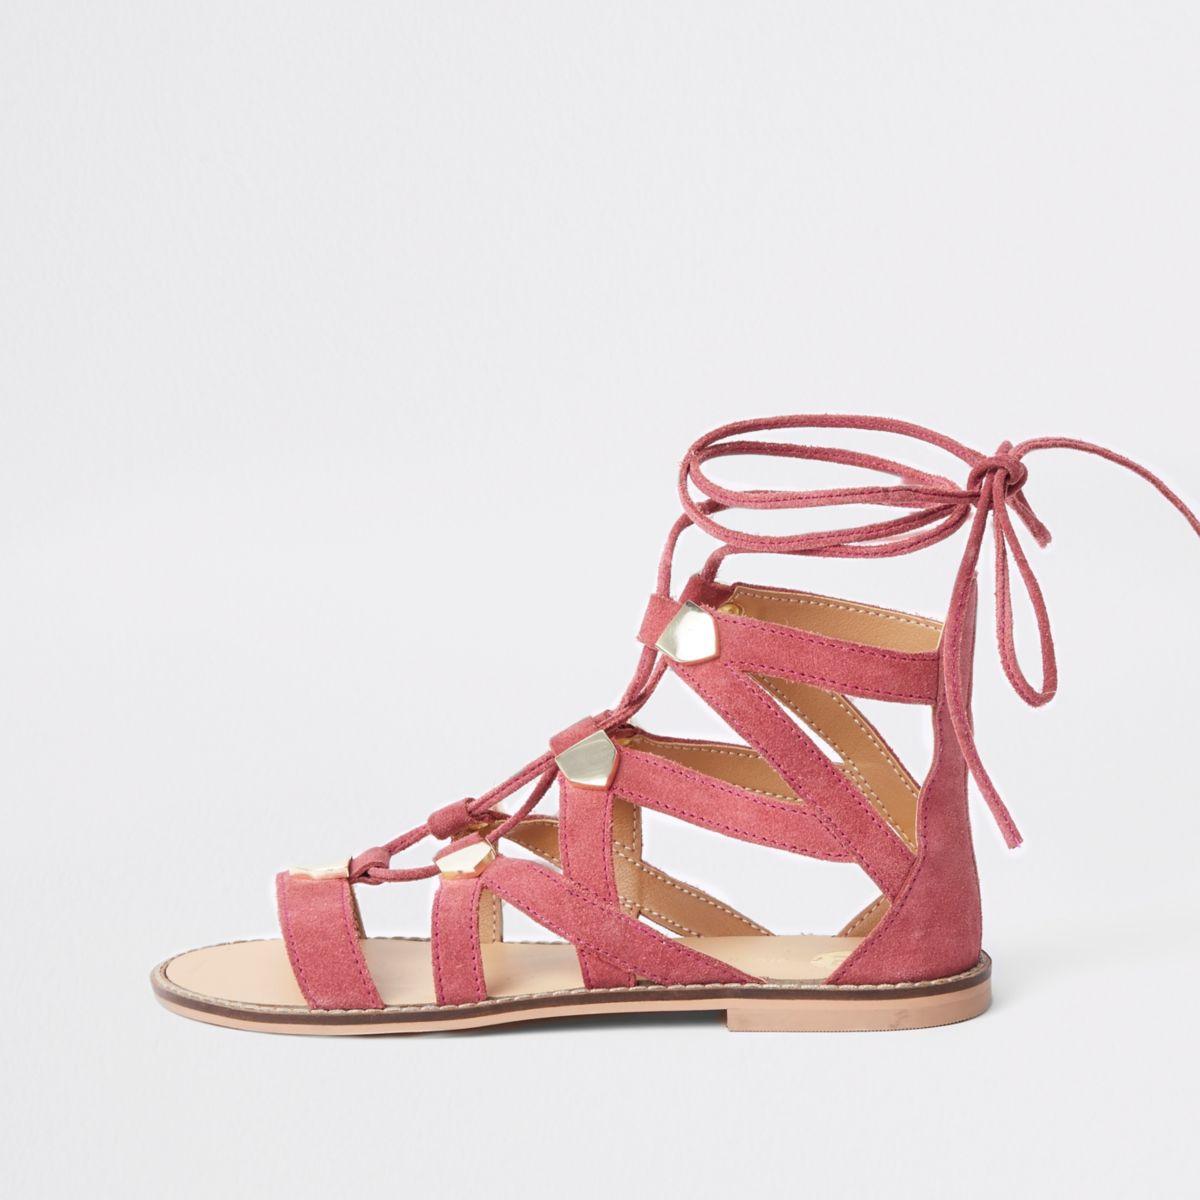 Sandales En Daim Rose Dentelle 2IxtqmznFo